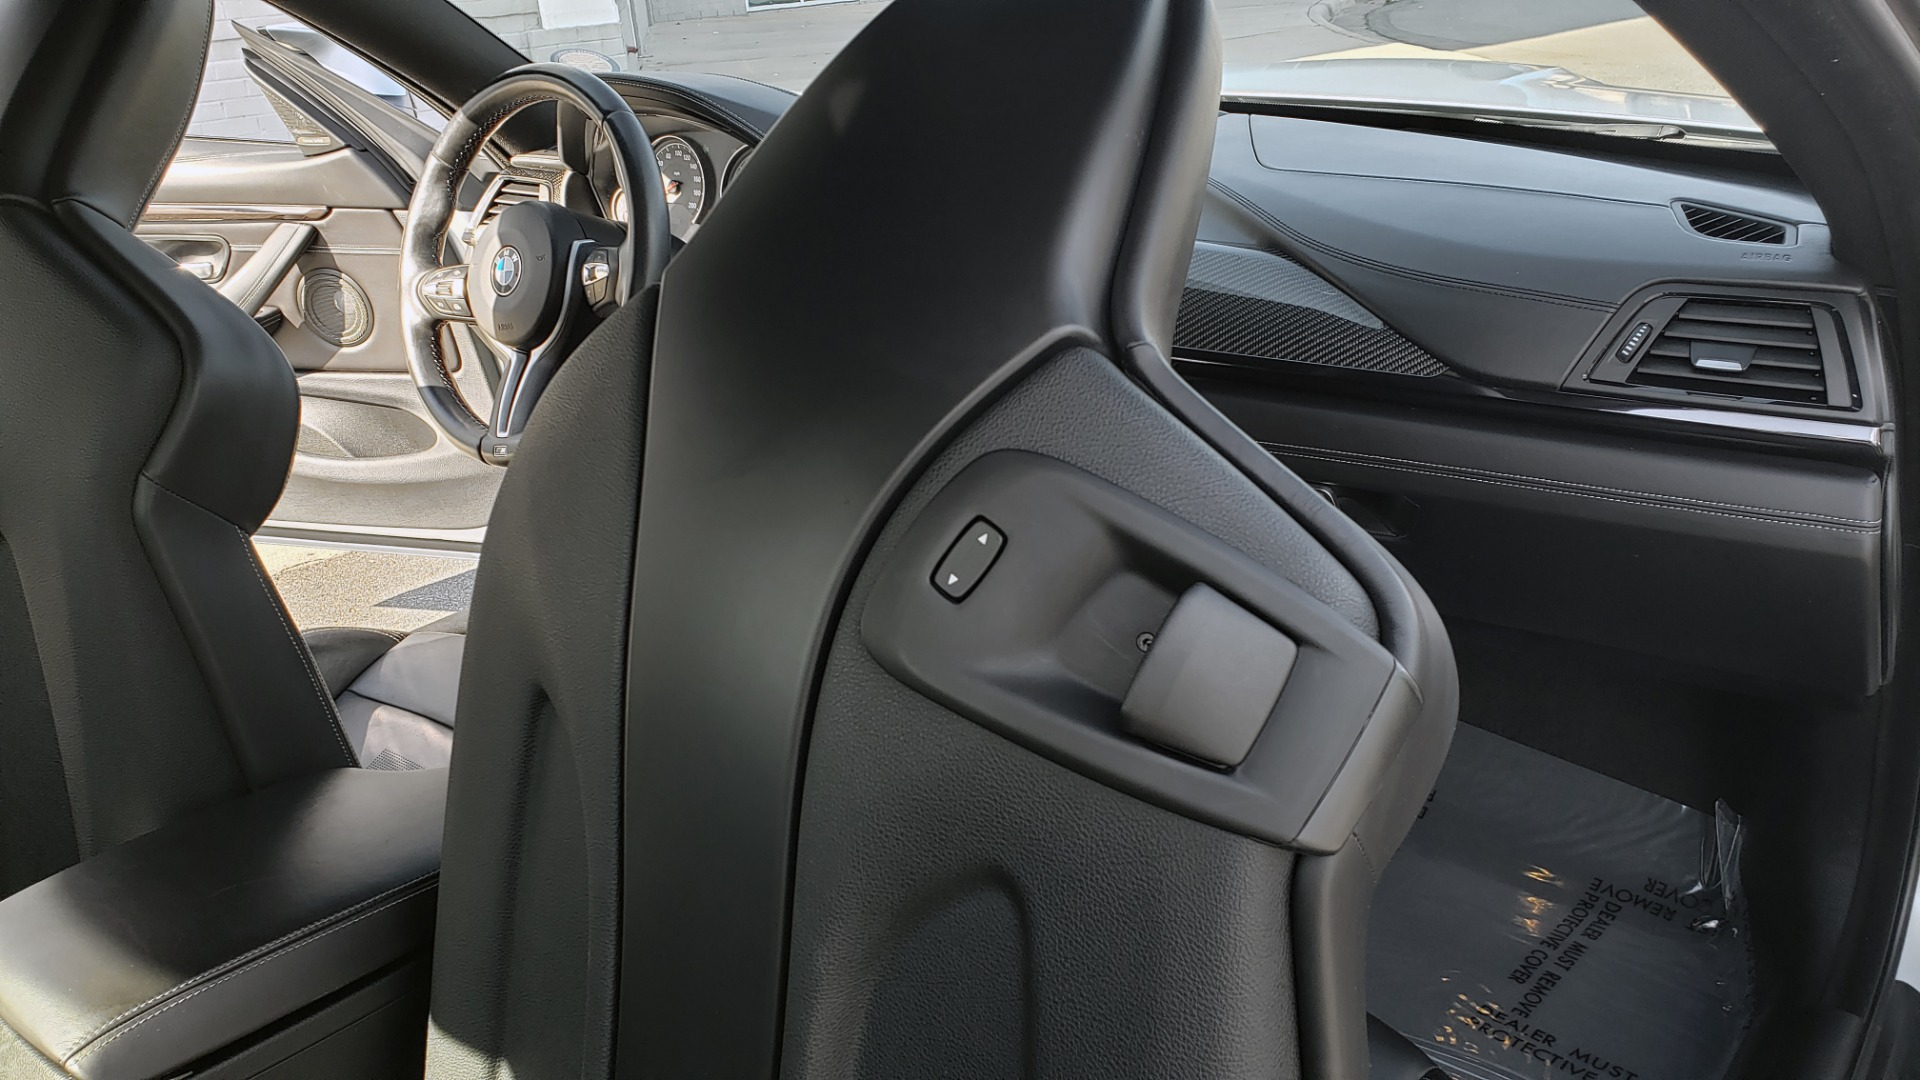 Used 2015 BMW M4 COUPE / EXEC PKG / DRVR ASST PLUS / LIGHTING / M-SUSPENSION for sale Sold at Formula Imports in Charlotte NC 28227 70